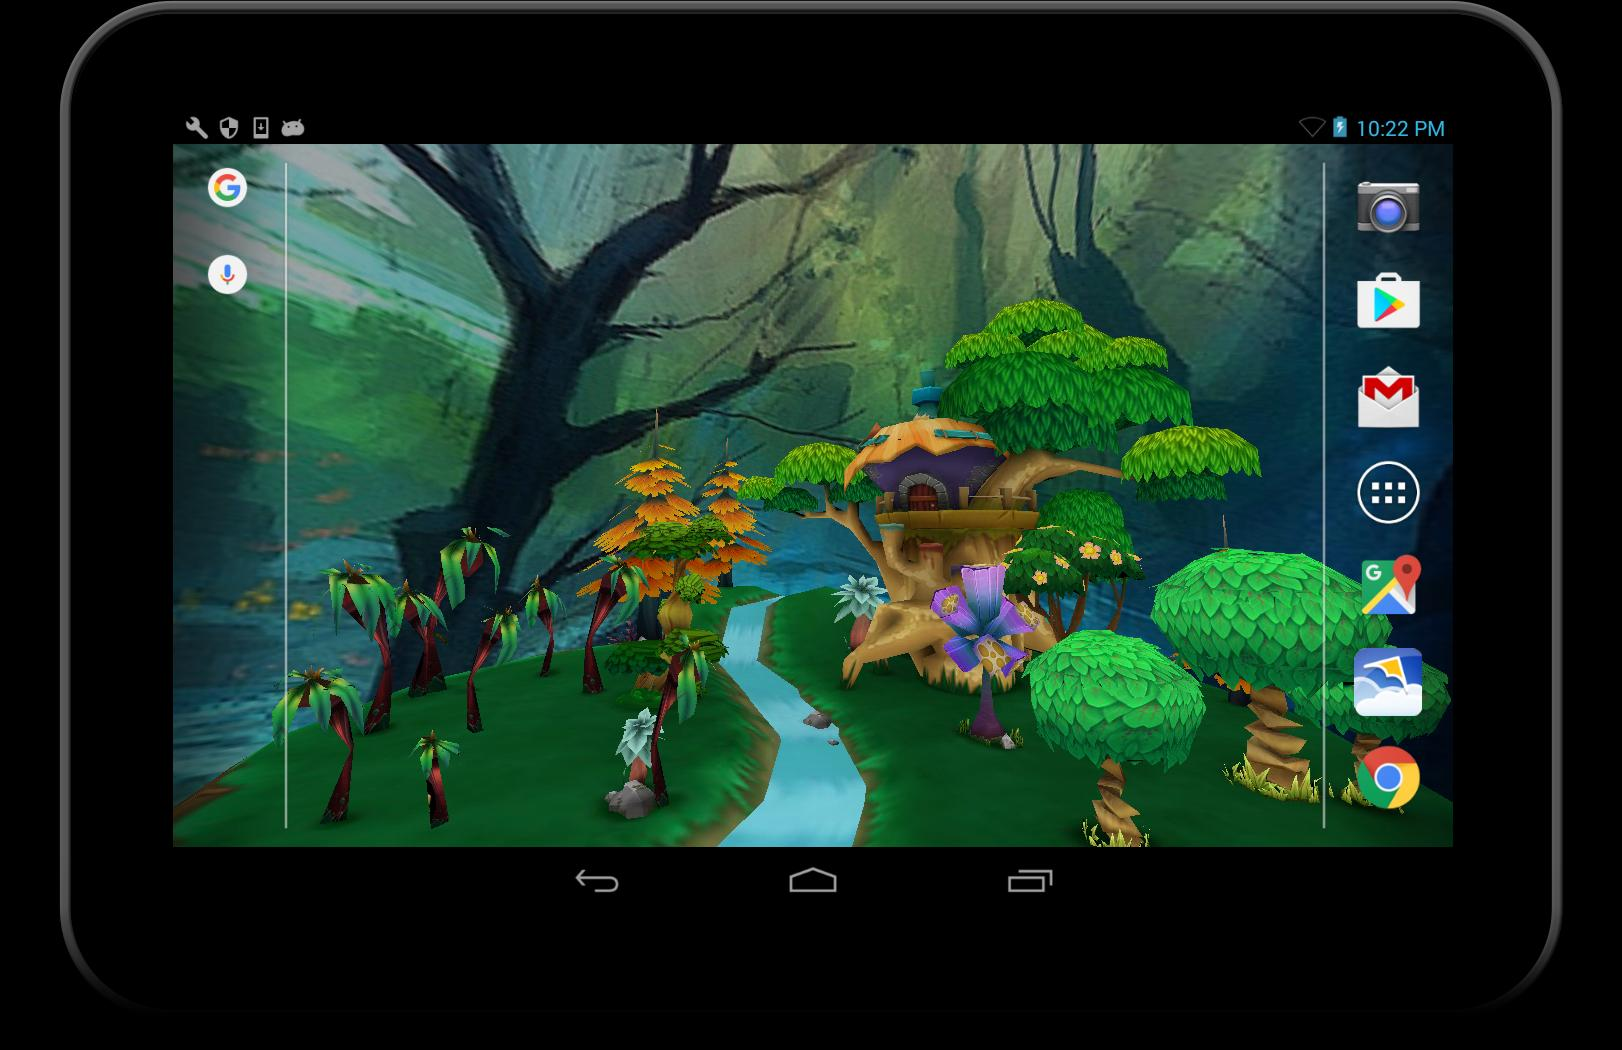 3d Kartun Taman Hidp Wallpaper For Android Apk Download